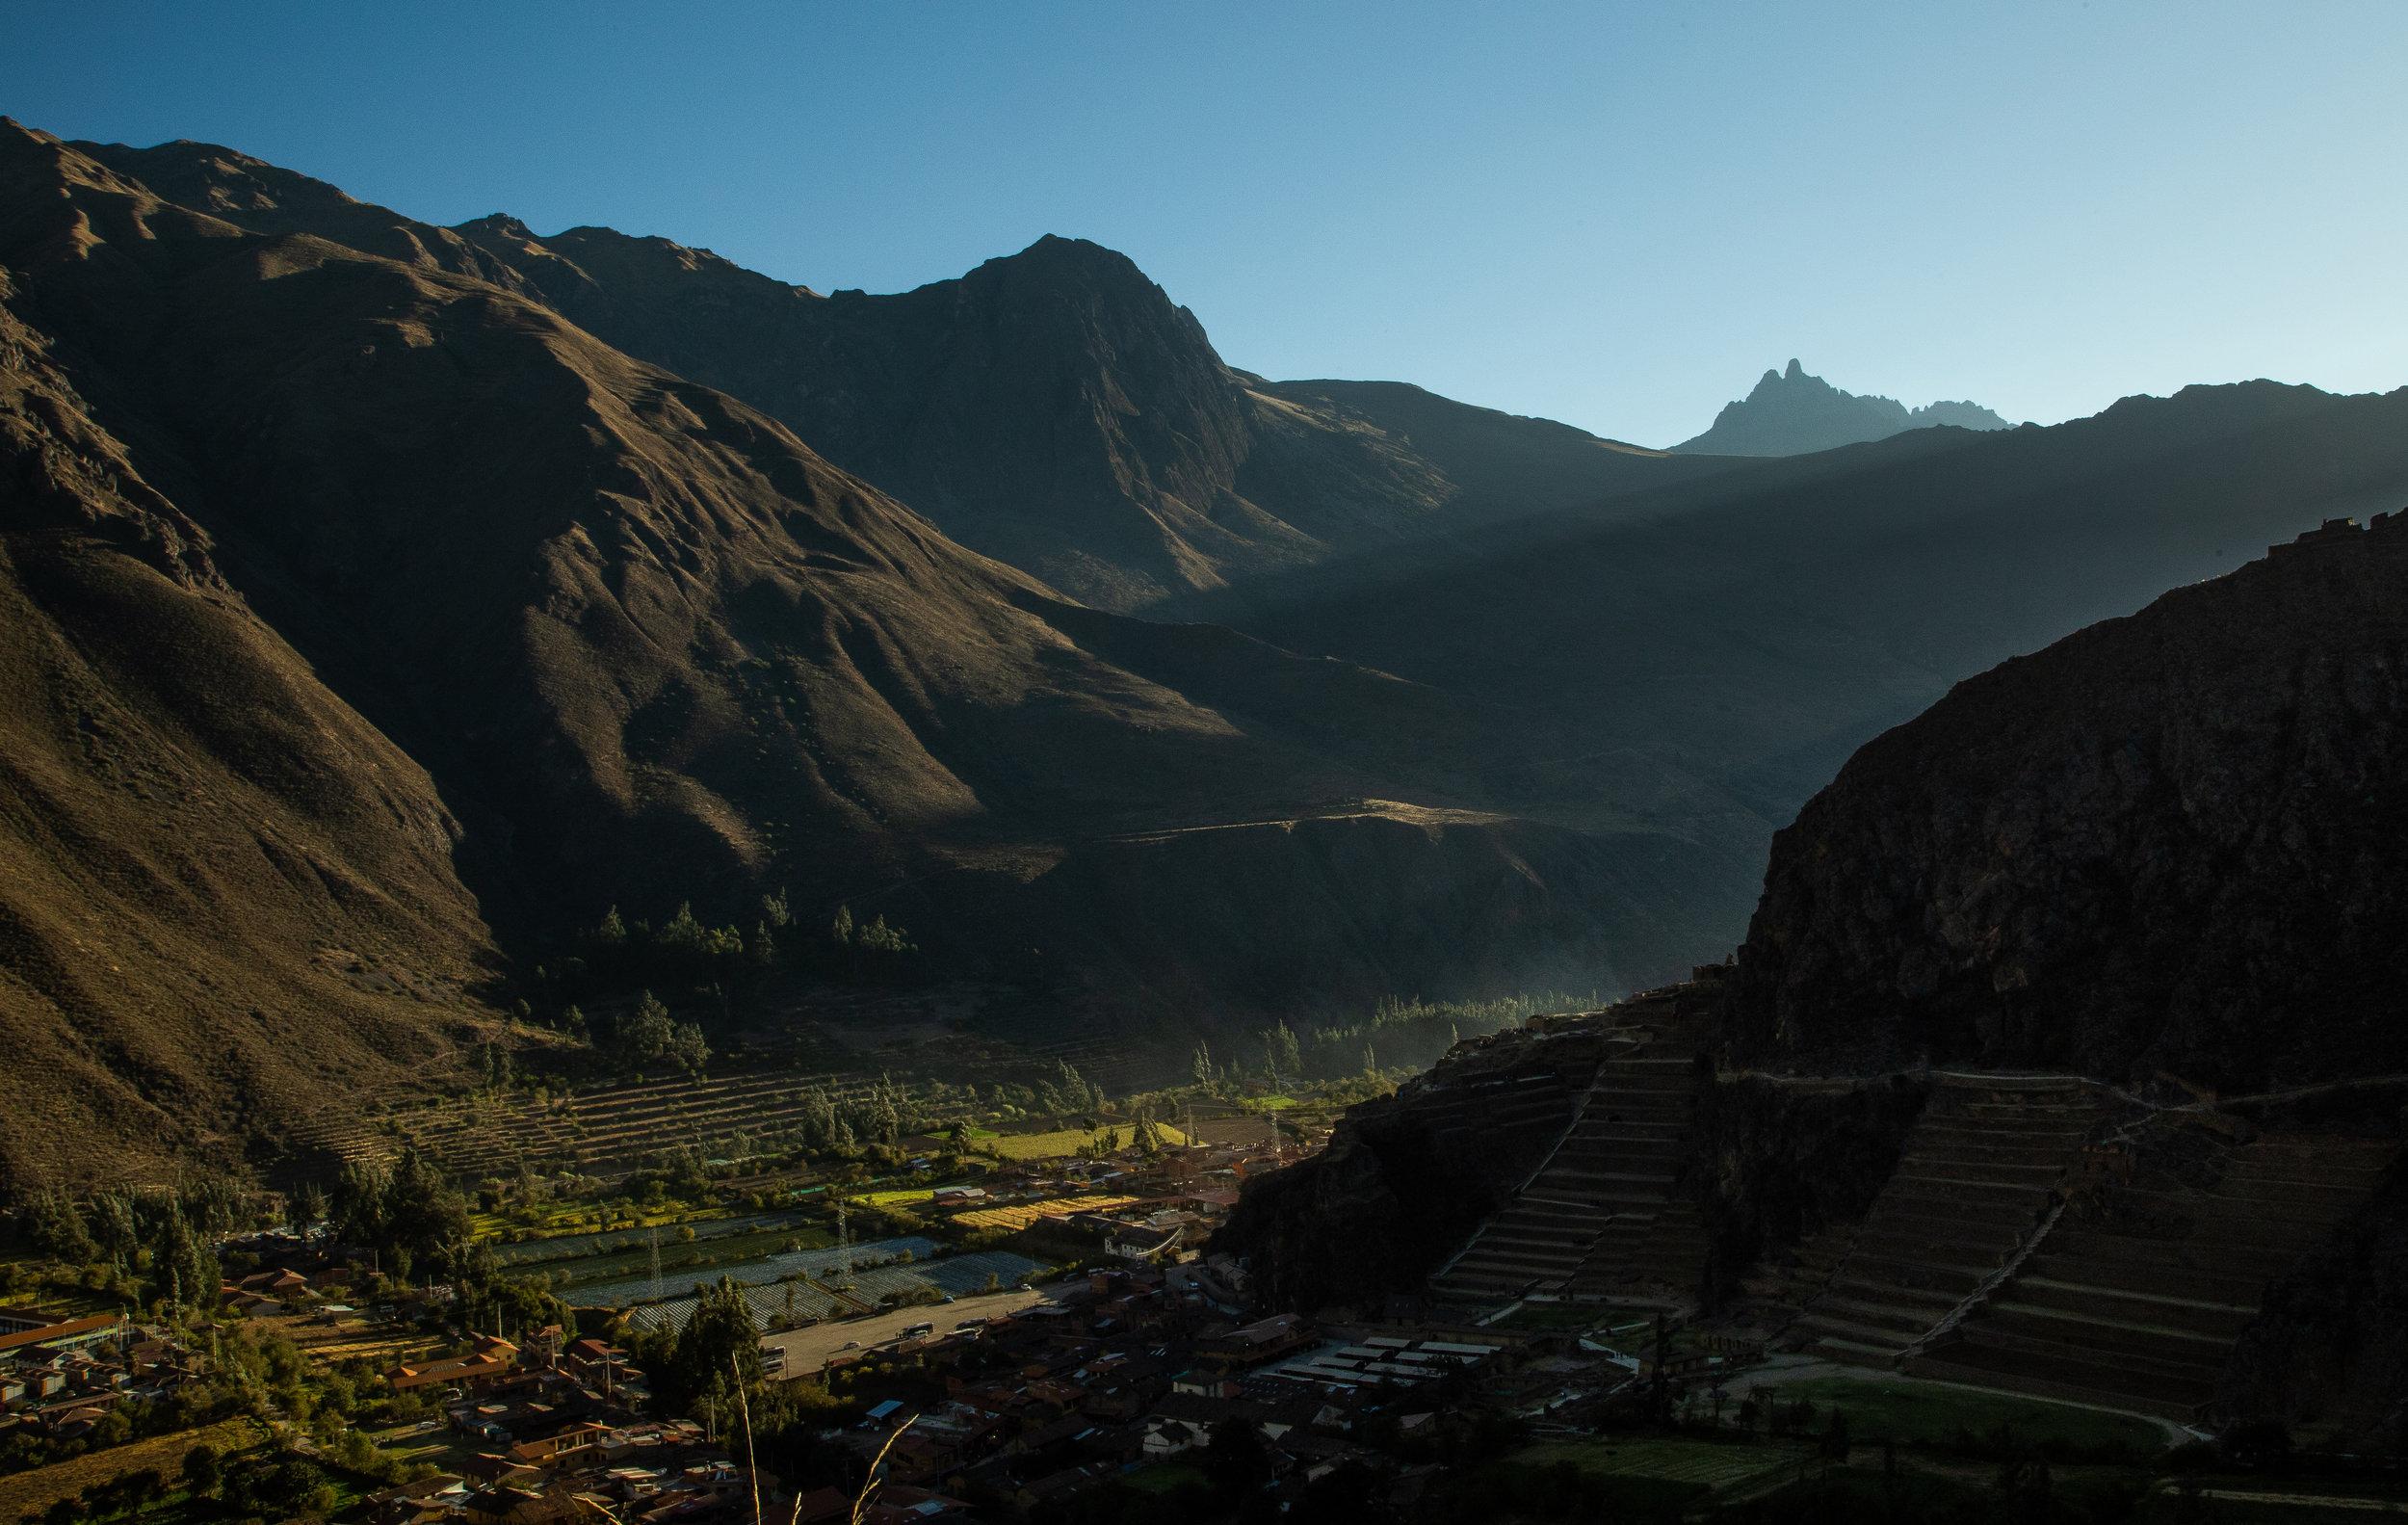 Sunset - Ollantaytambo, Cusco Region